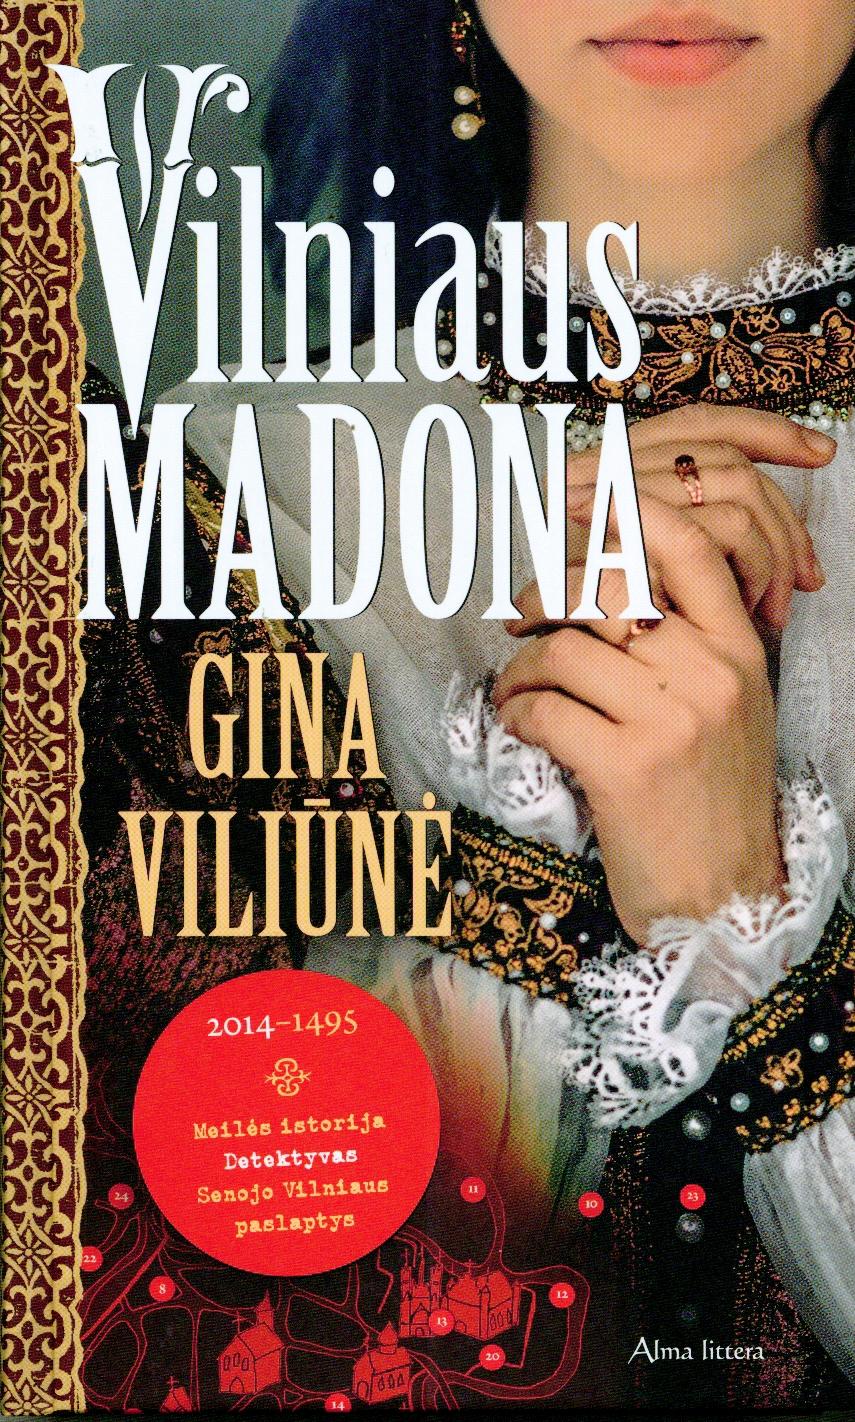 Vilniaus Madona